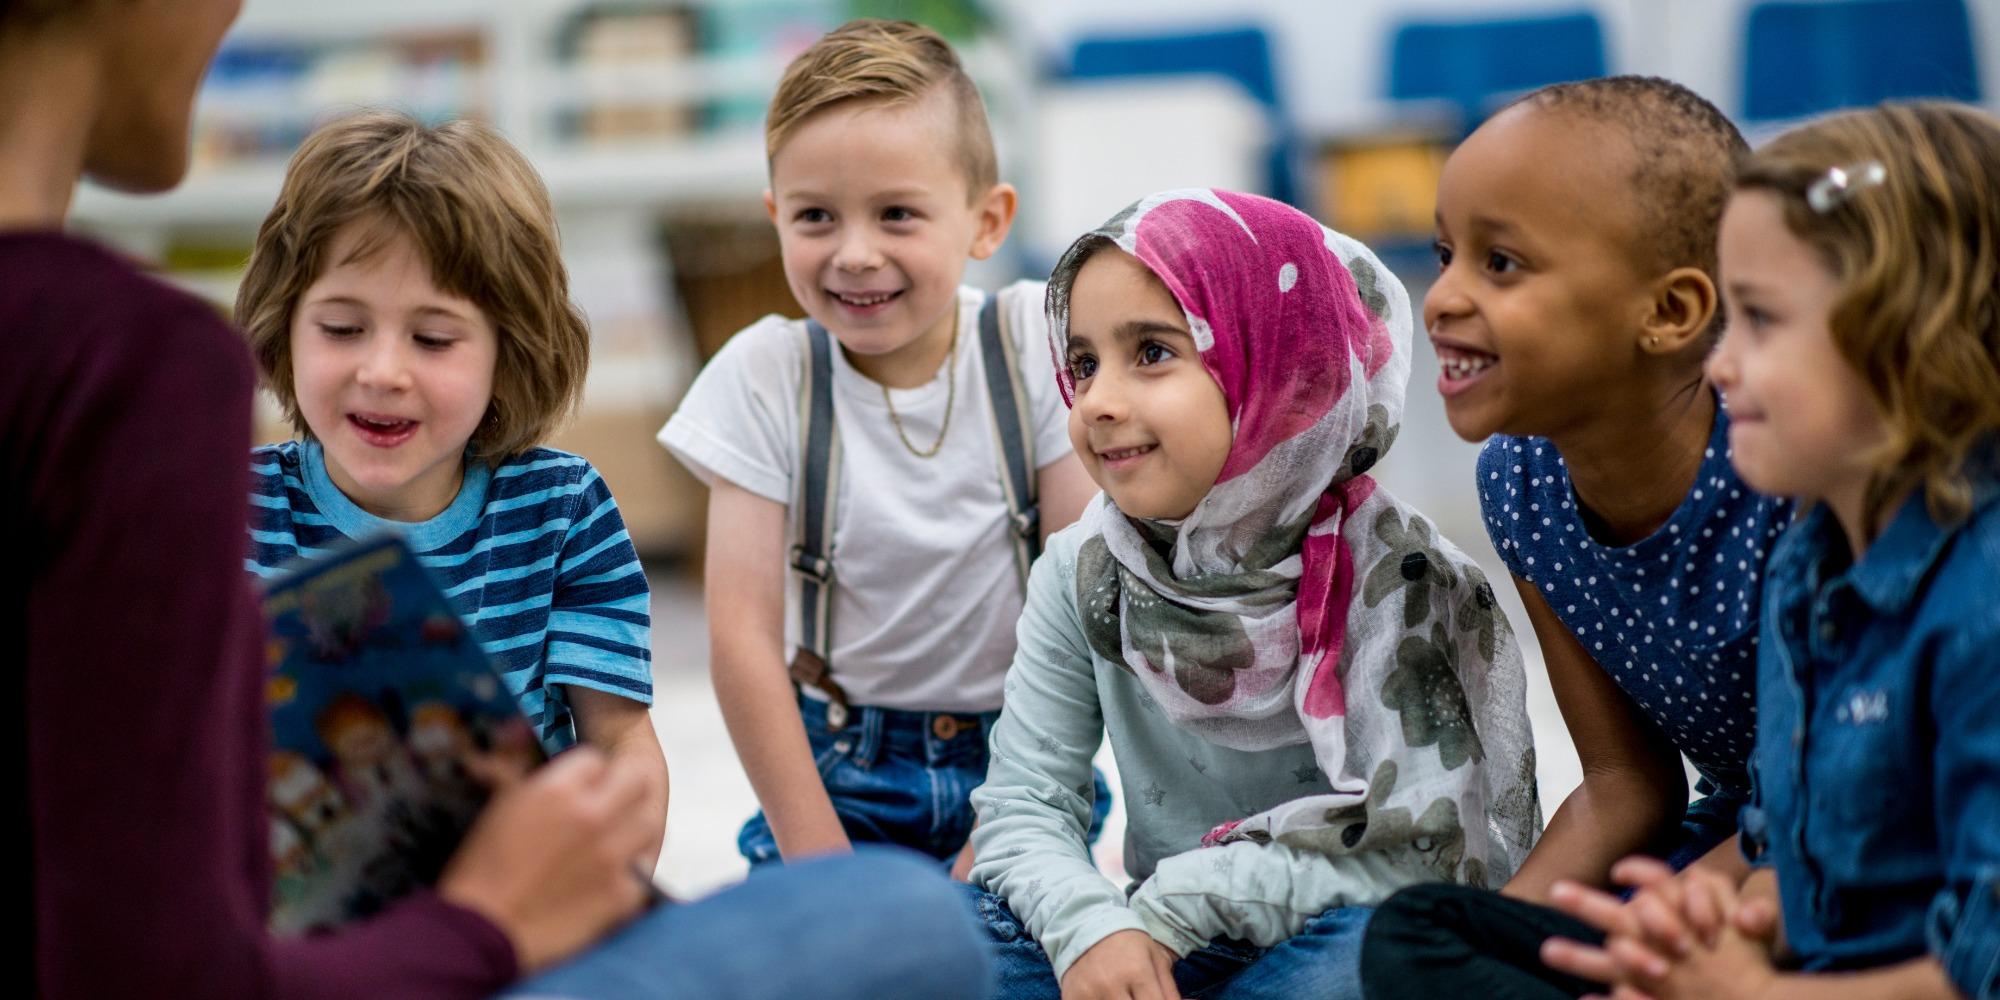 children listen to their teacher read a book to them